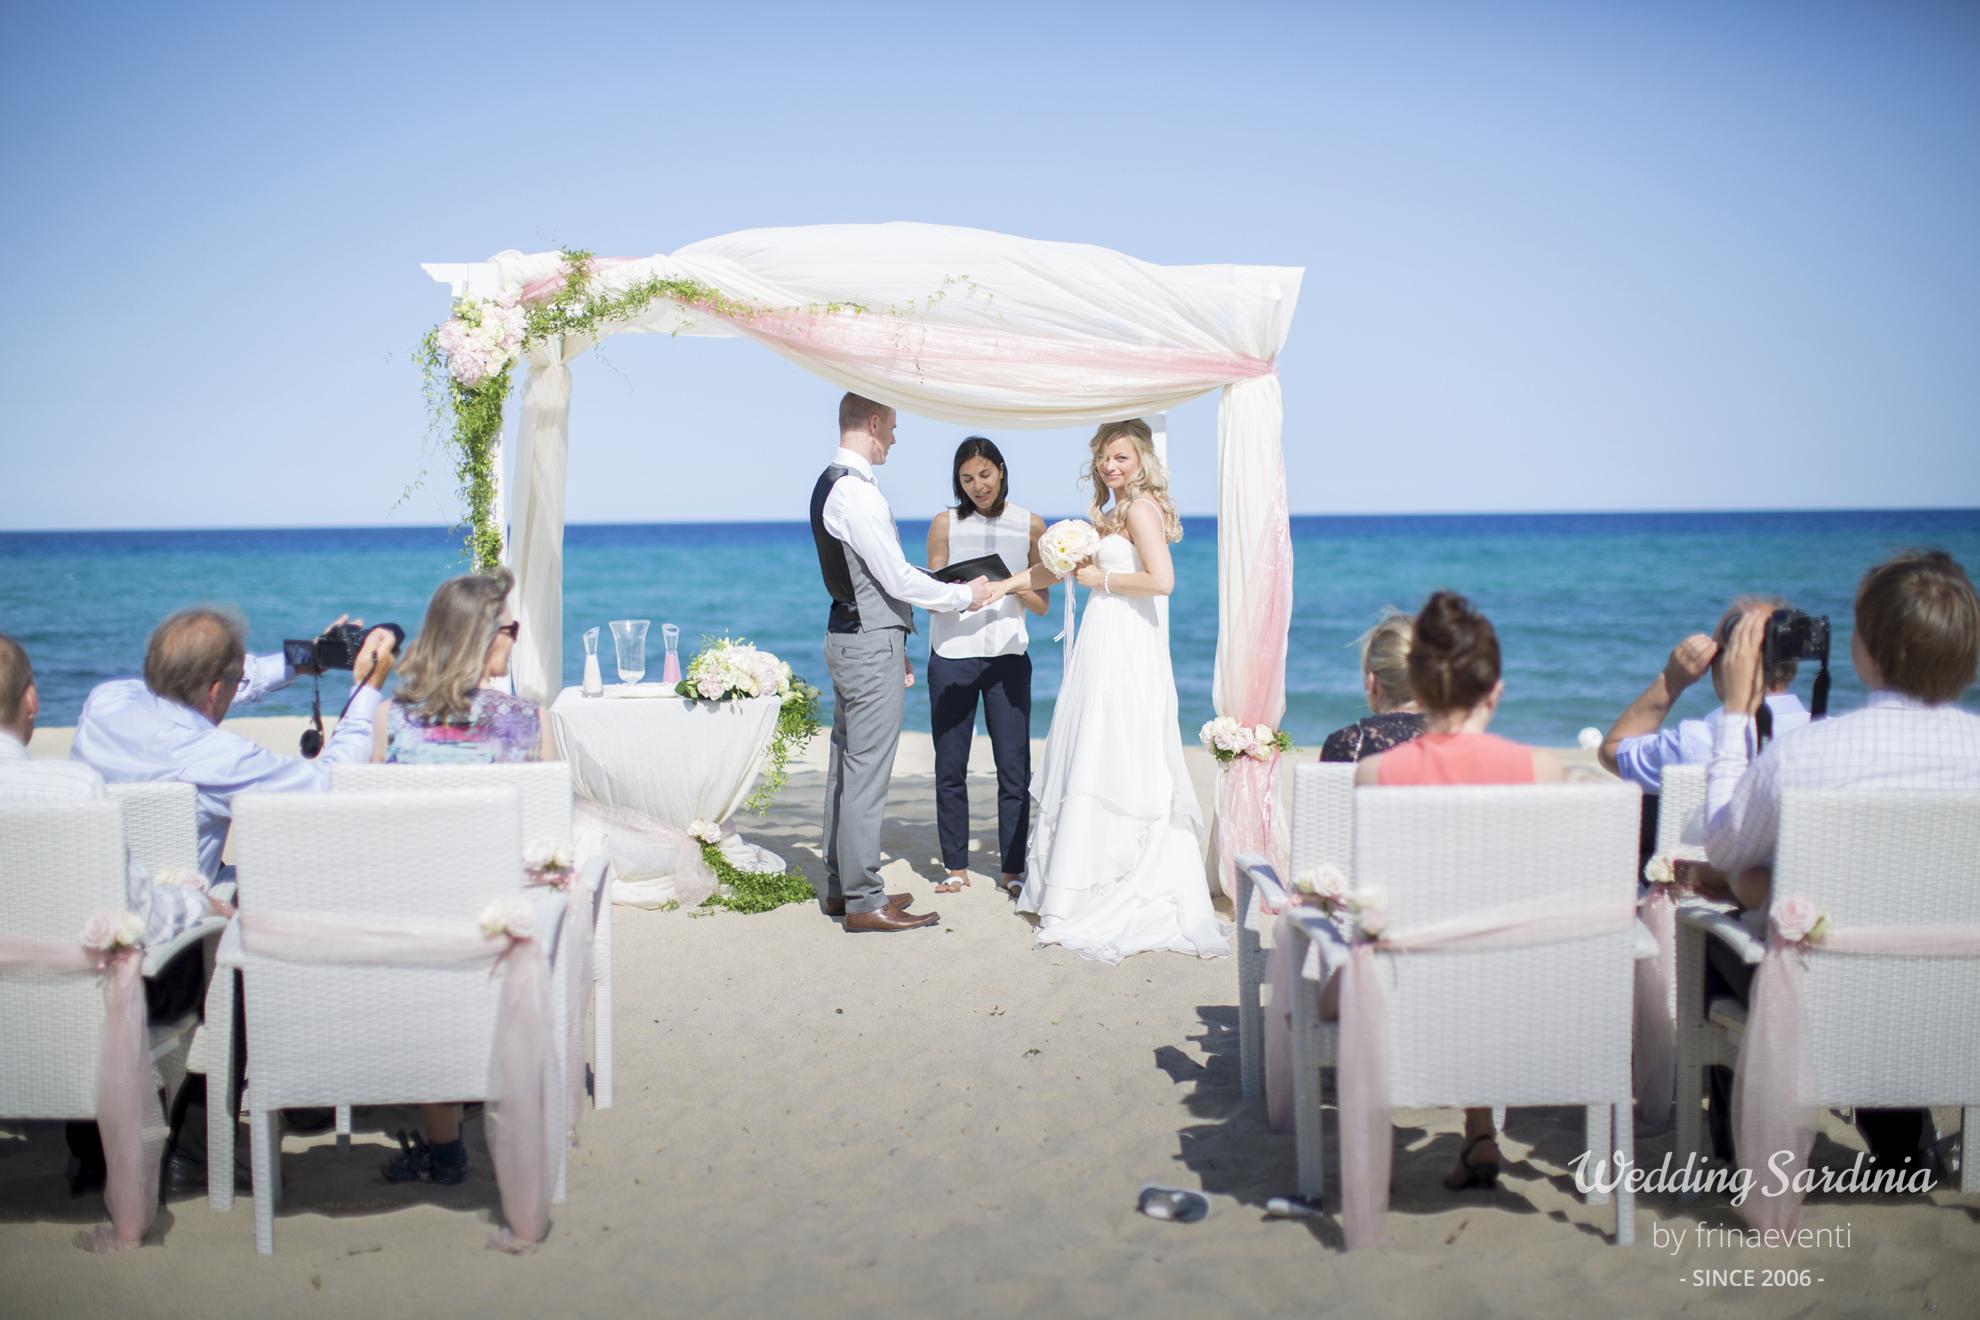 Beach weddings in Sardinia - Frinaeventi Wedding Planners